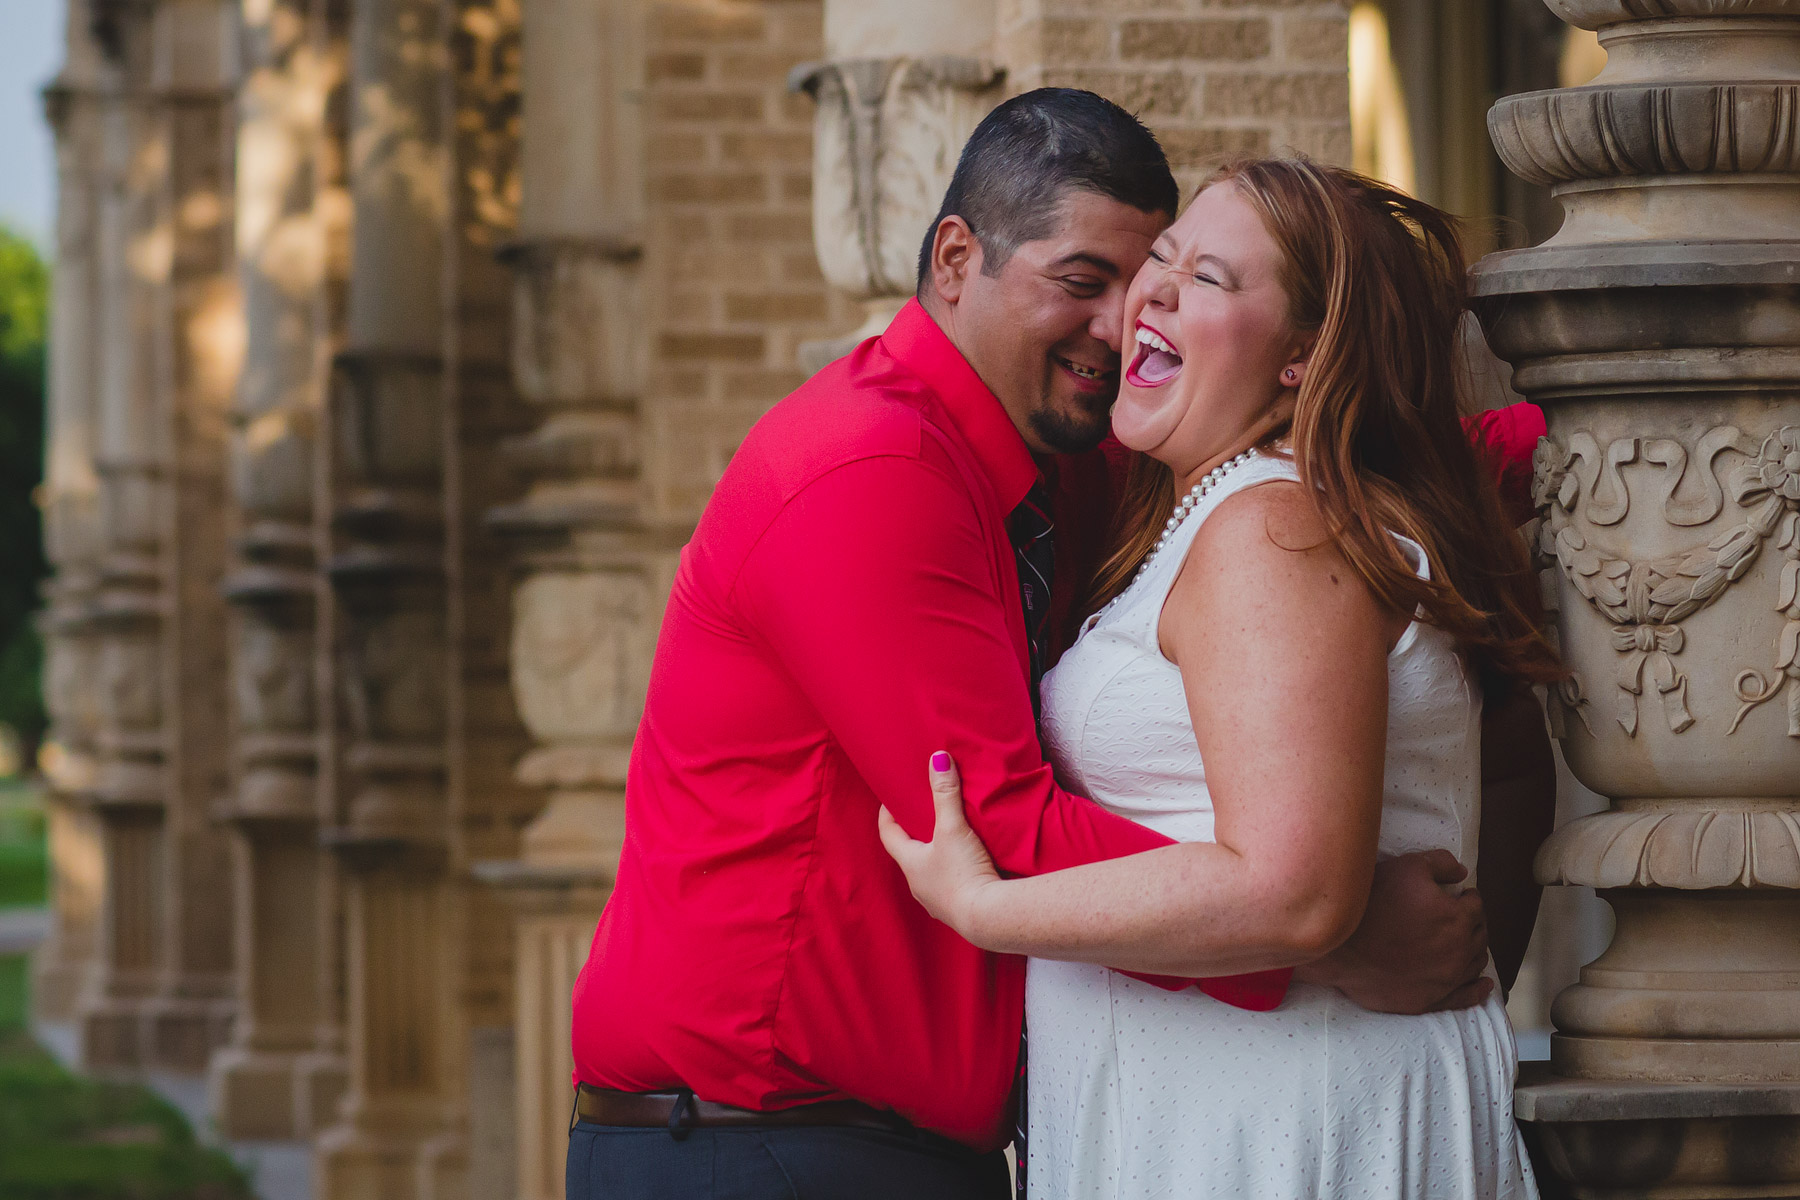 kristin_bednarz_documentary_wedding_photographer_20190615_00356_Hobson_Sharp.jpg